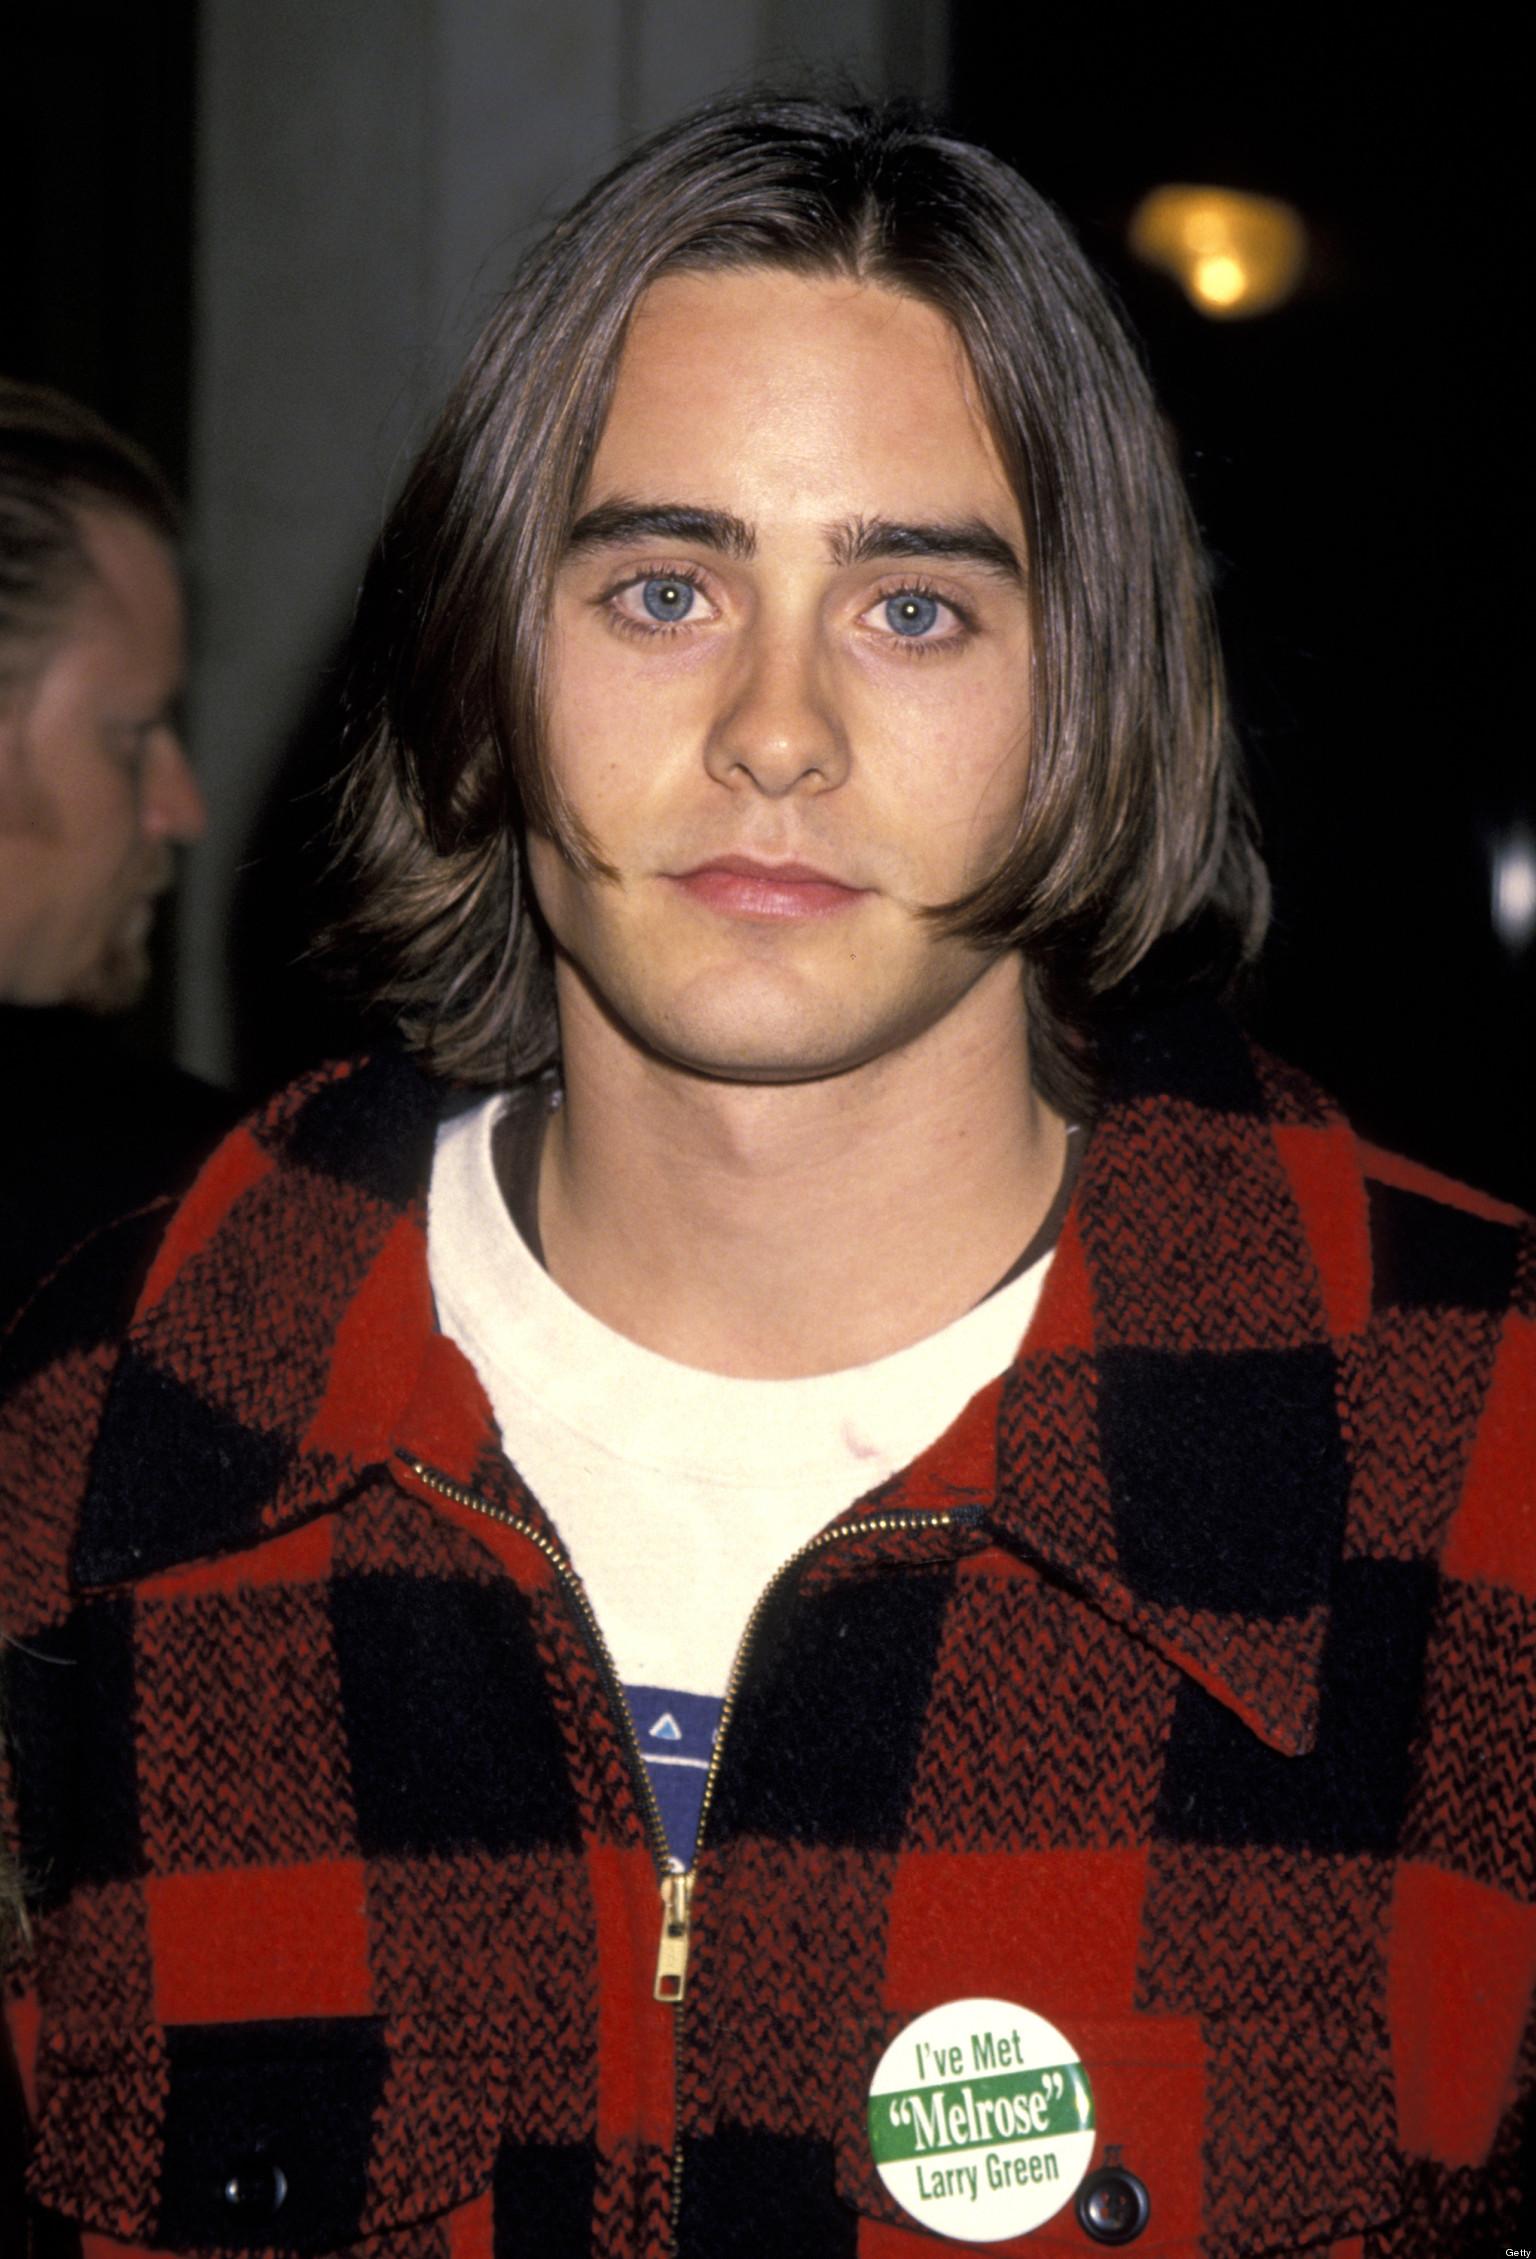 Jared Leto For Nylon Guys: Jared Leto Turns 41: See The Birthday Boy's Career